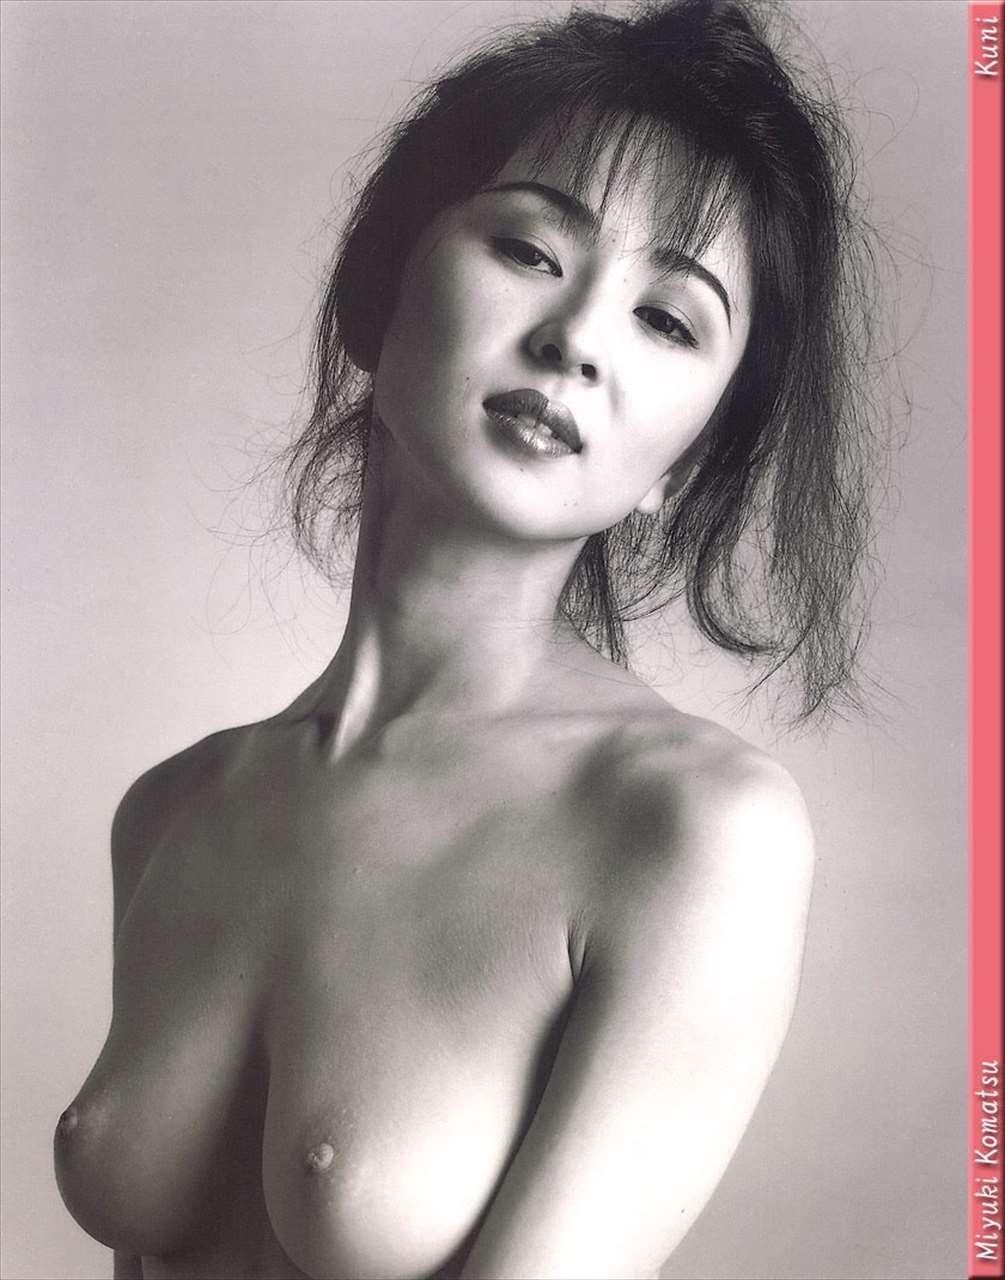 Komatsu Miyuki 小松みゆき